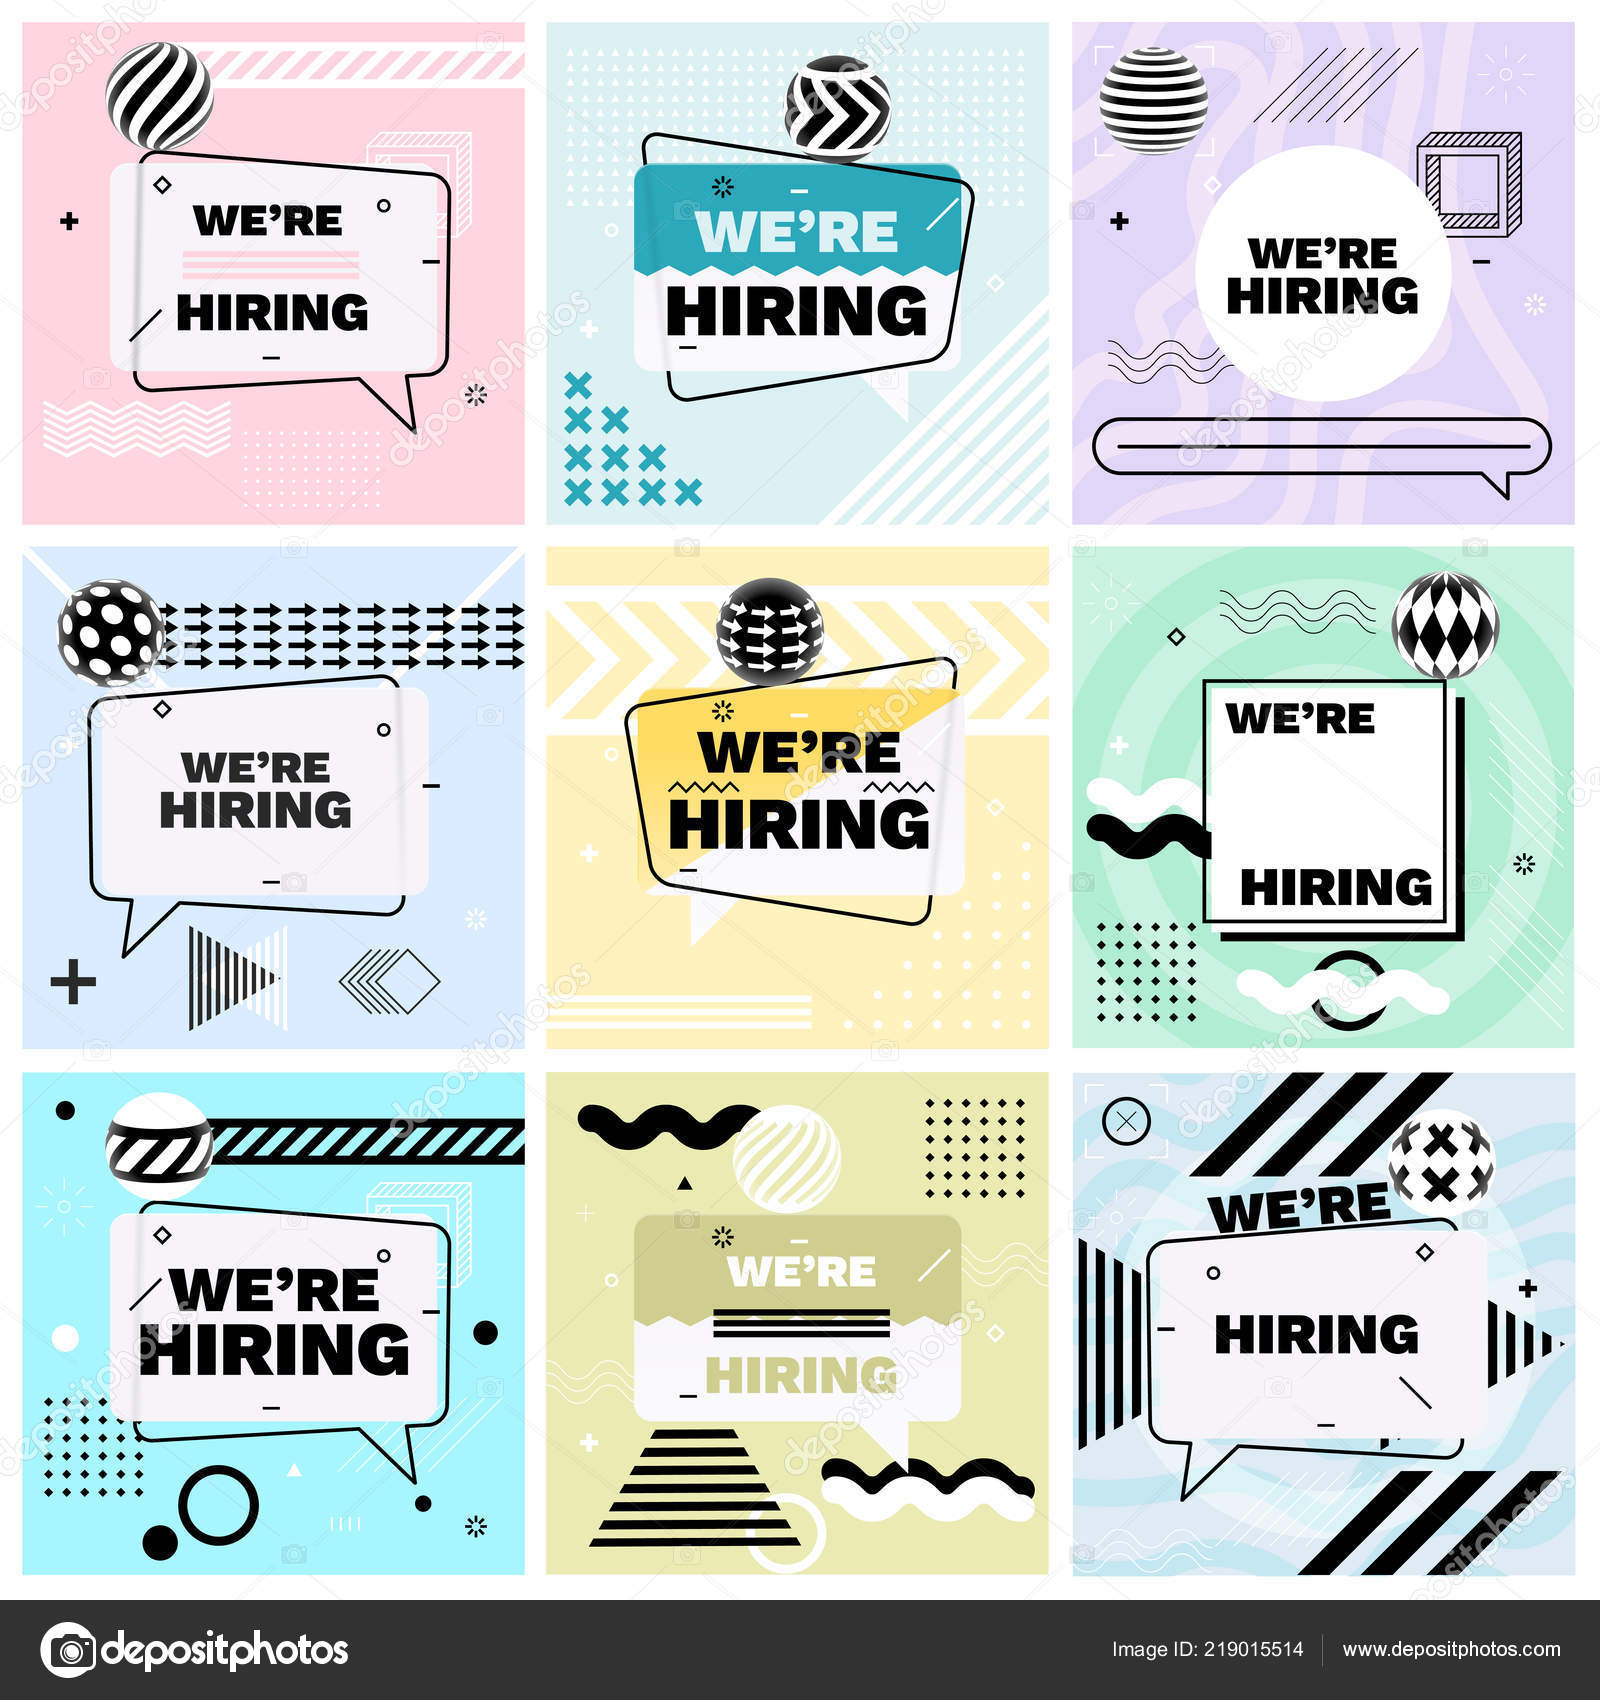 Pleasing Hiring Template Banner Design Poster Set Job Vacancy Home Interior And Landscaping Ologienasavecom